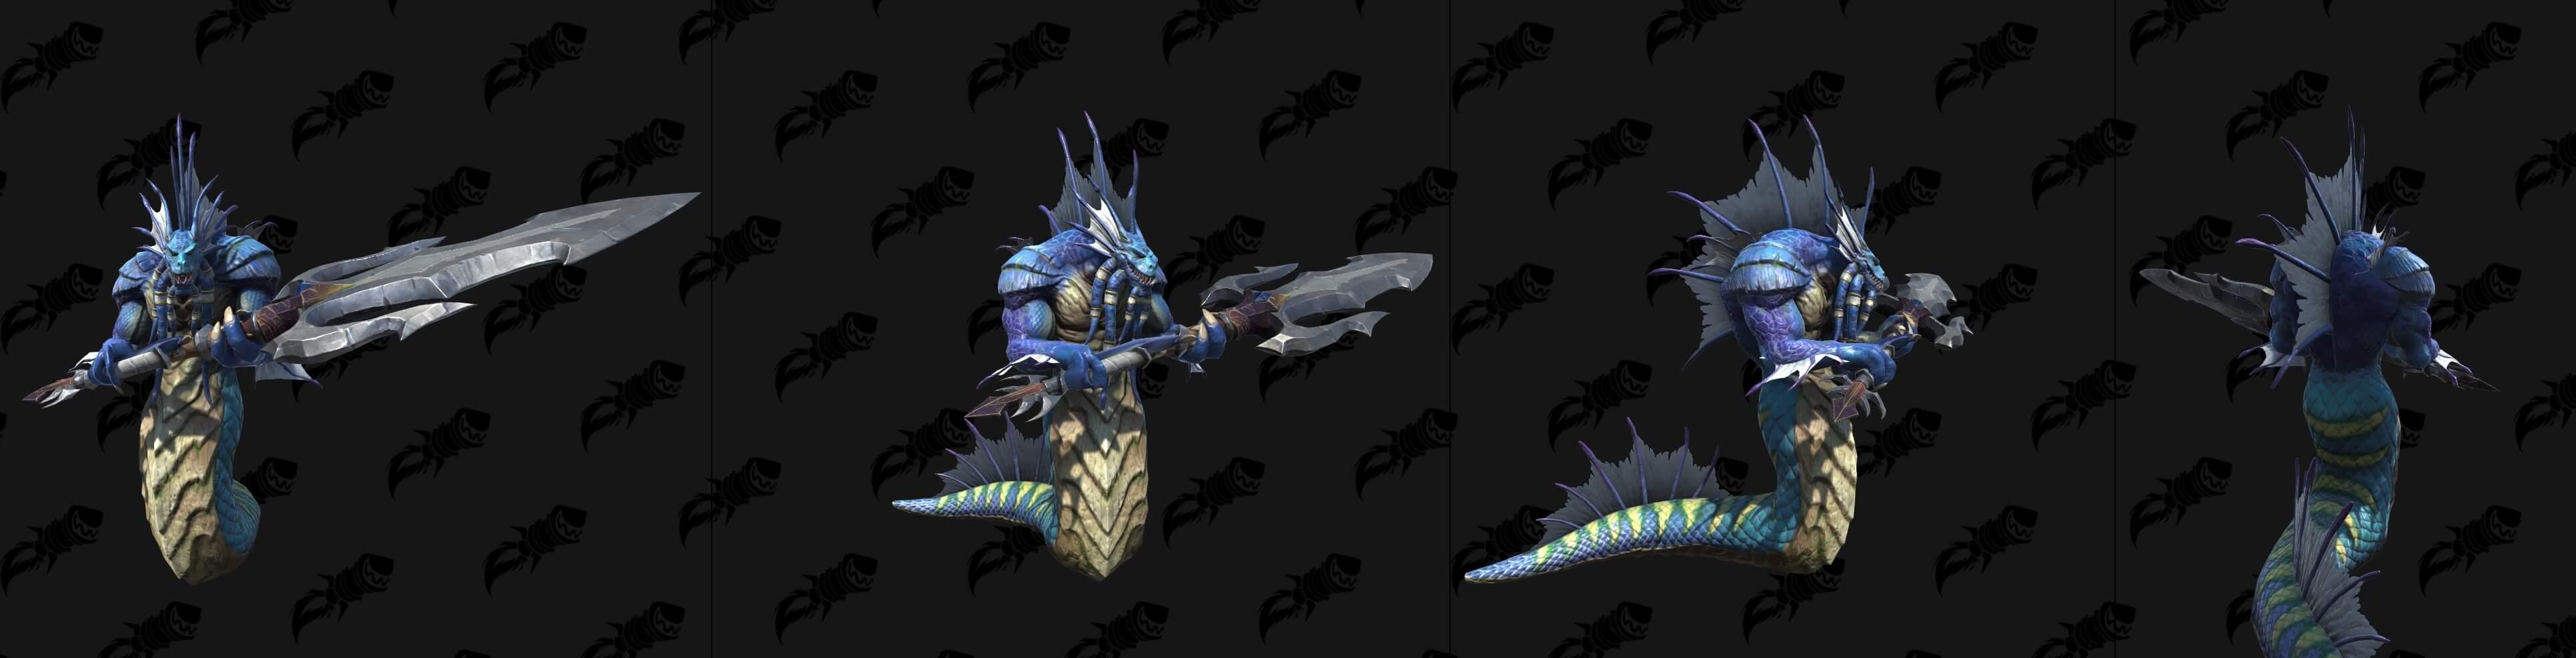 Нага-мирмидон Warcraft lll: Reforged